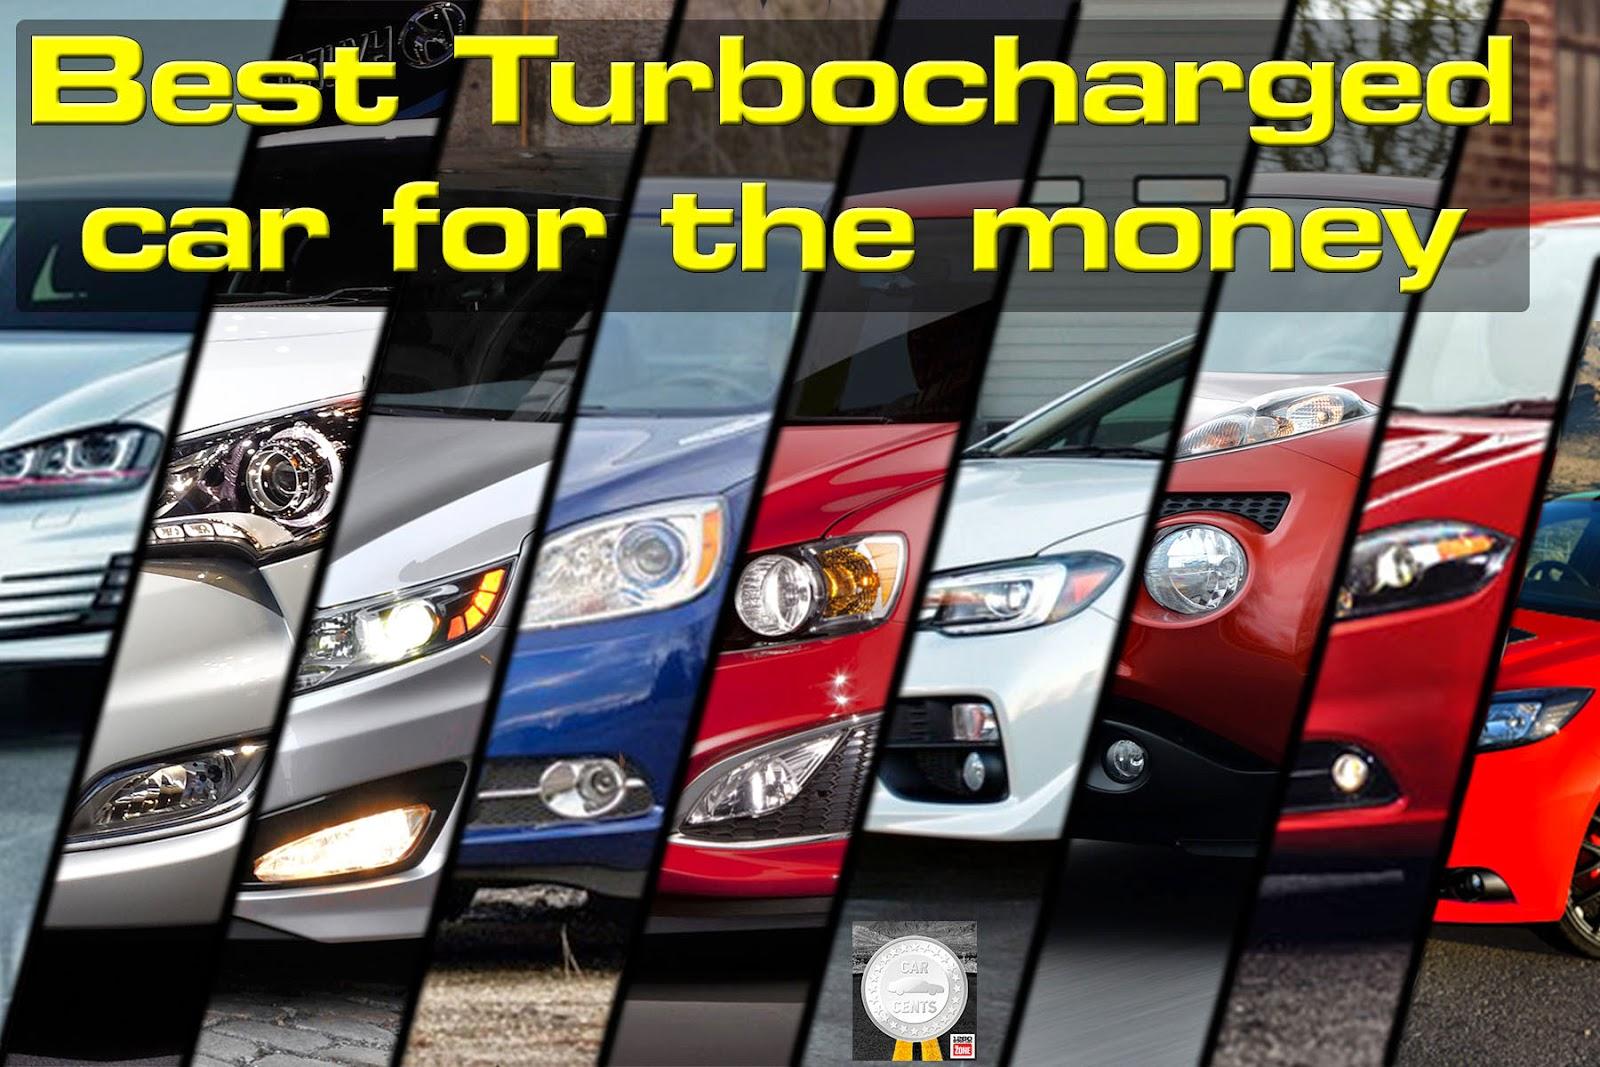 utah car cents got turbo best turbo cars for the money 2014. Black Bedroom Furniture Sets. Home Design Ideas